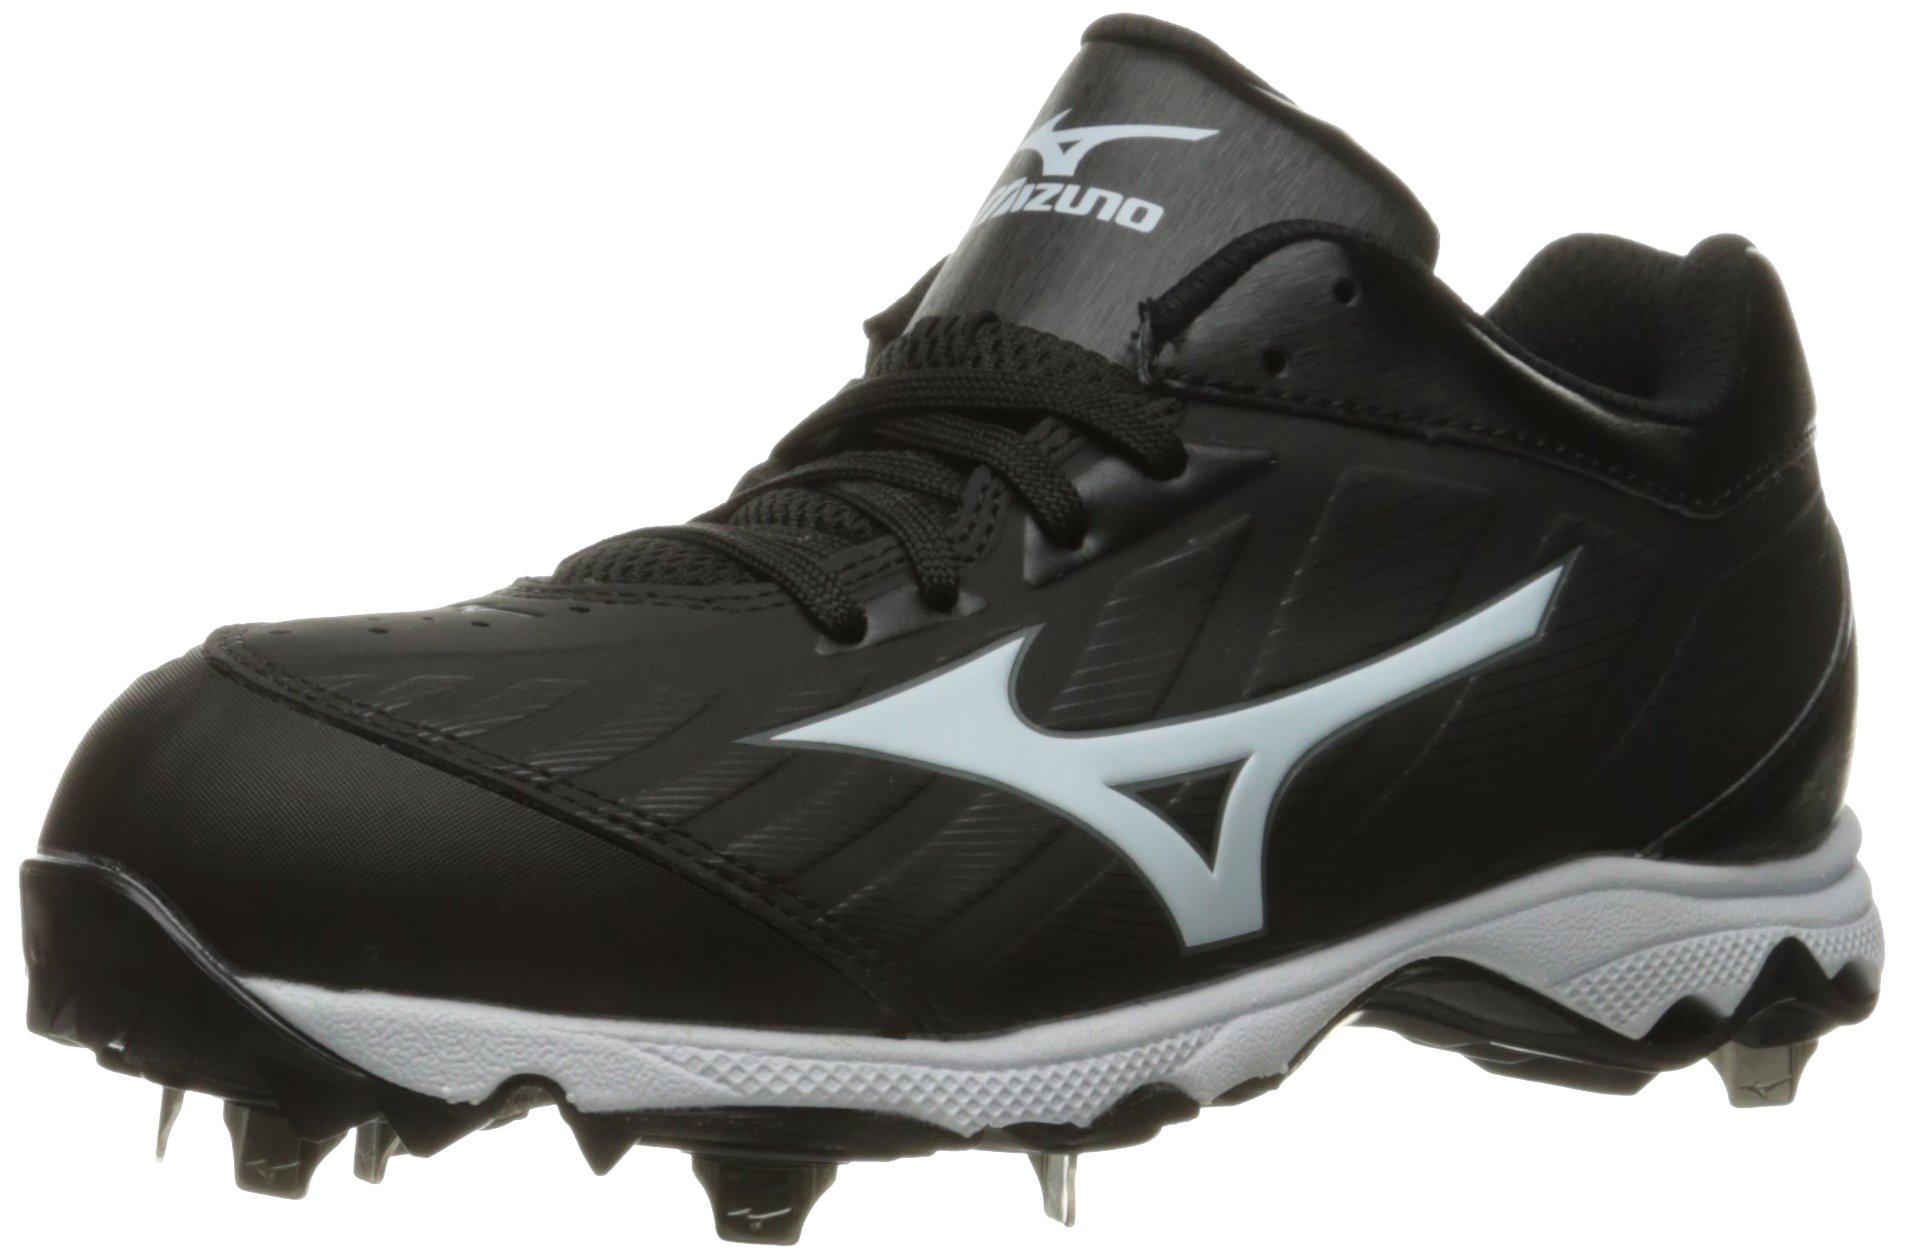 Mizuno Women's 9-Spike Advanced Sweep 3 Softball Shoe, Black/White, 12 D US by Mizuno